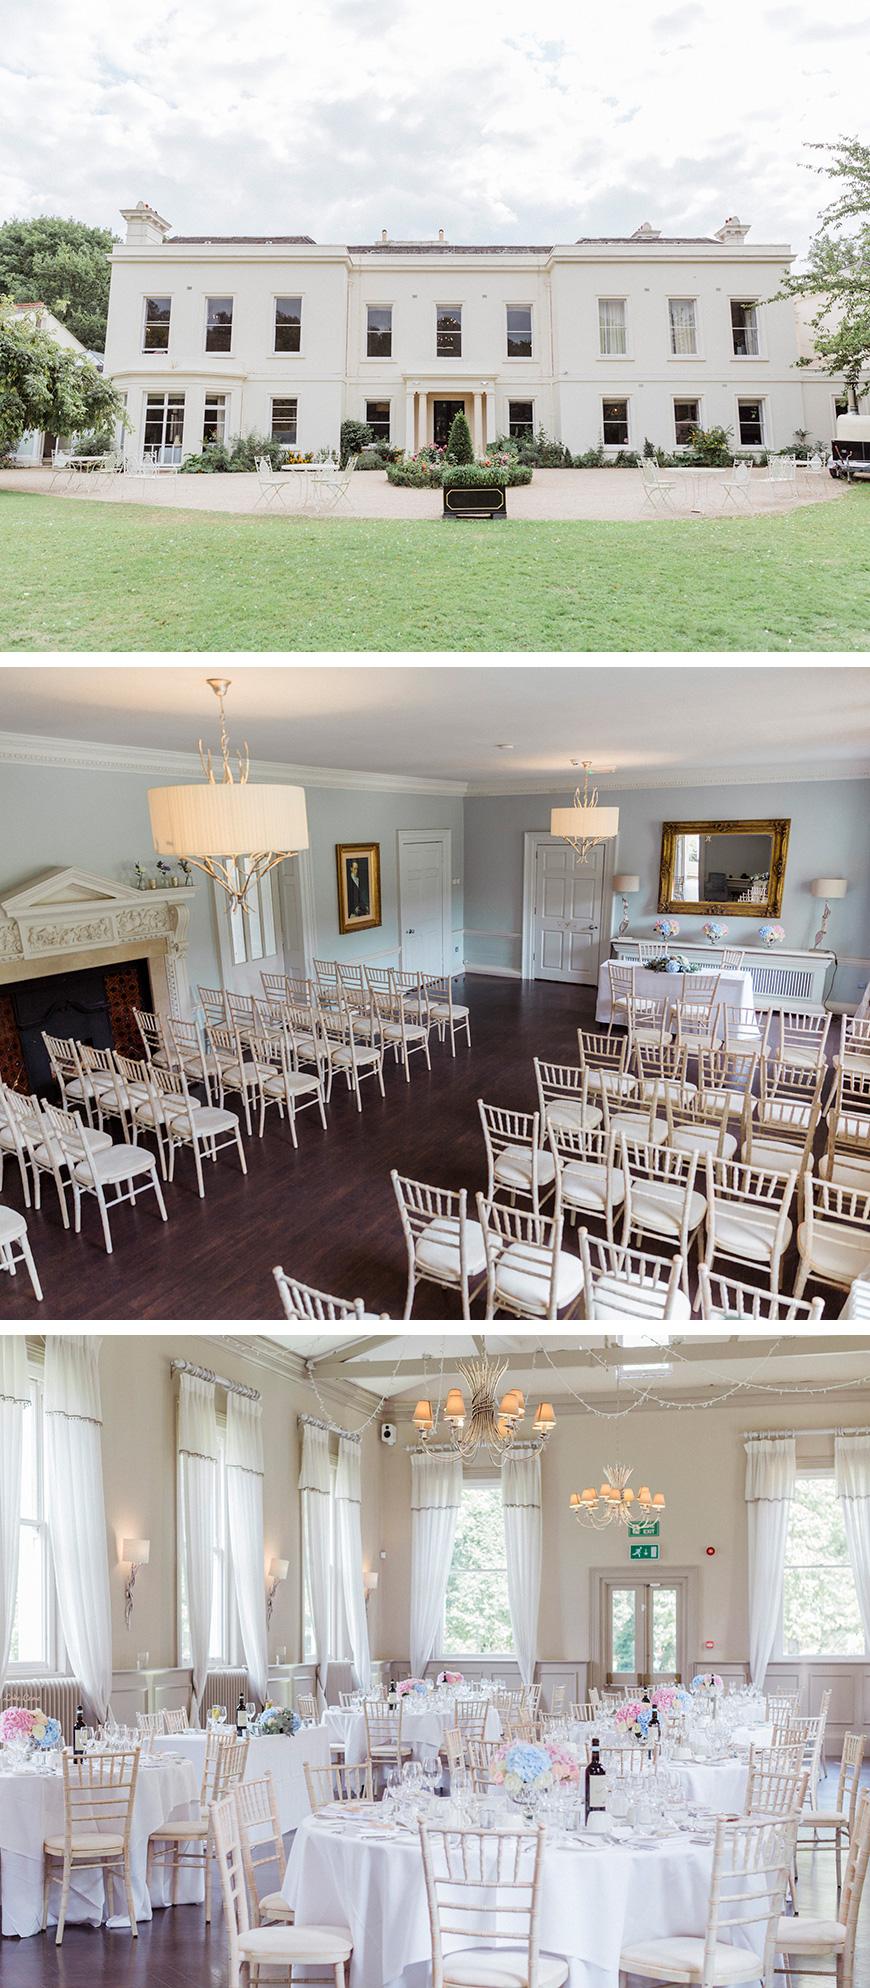 Real Wedding - Maggie and Deborah's Pretty Pastel Wedding At Morden Hall   CHWV